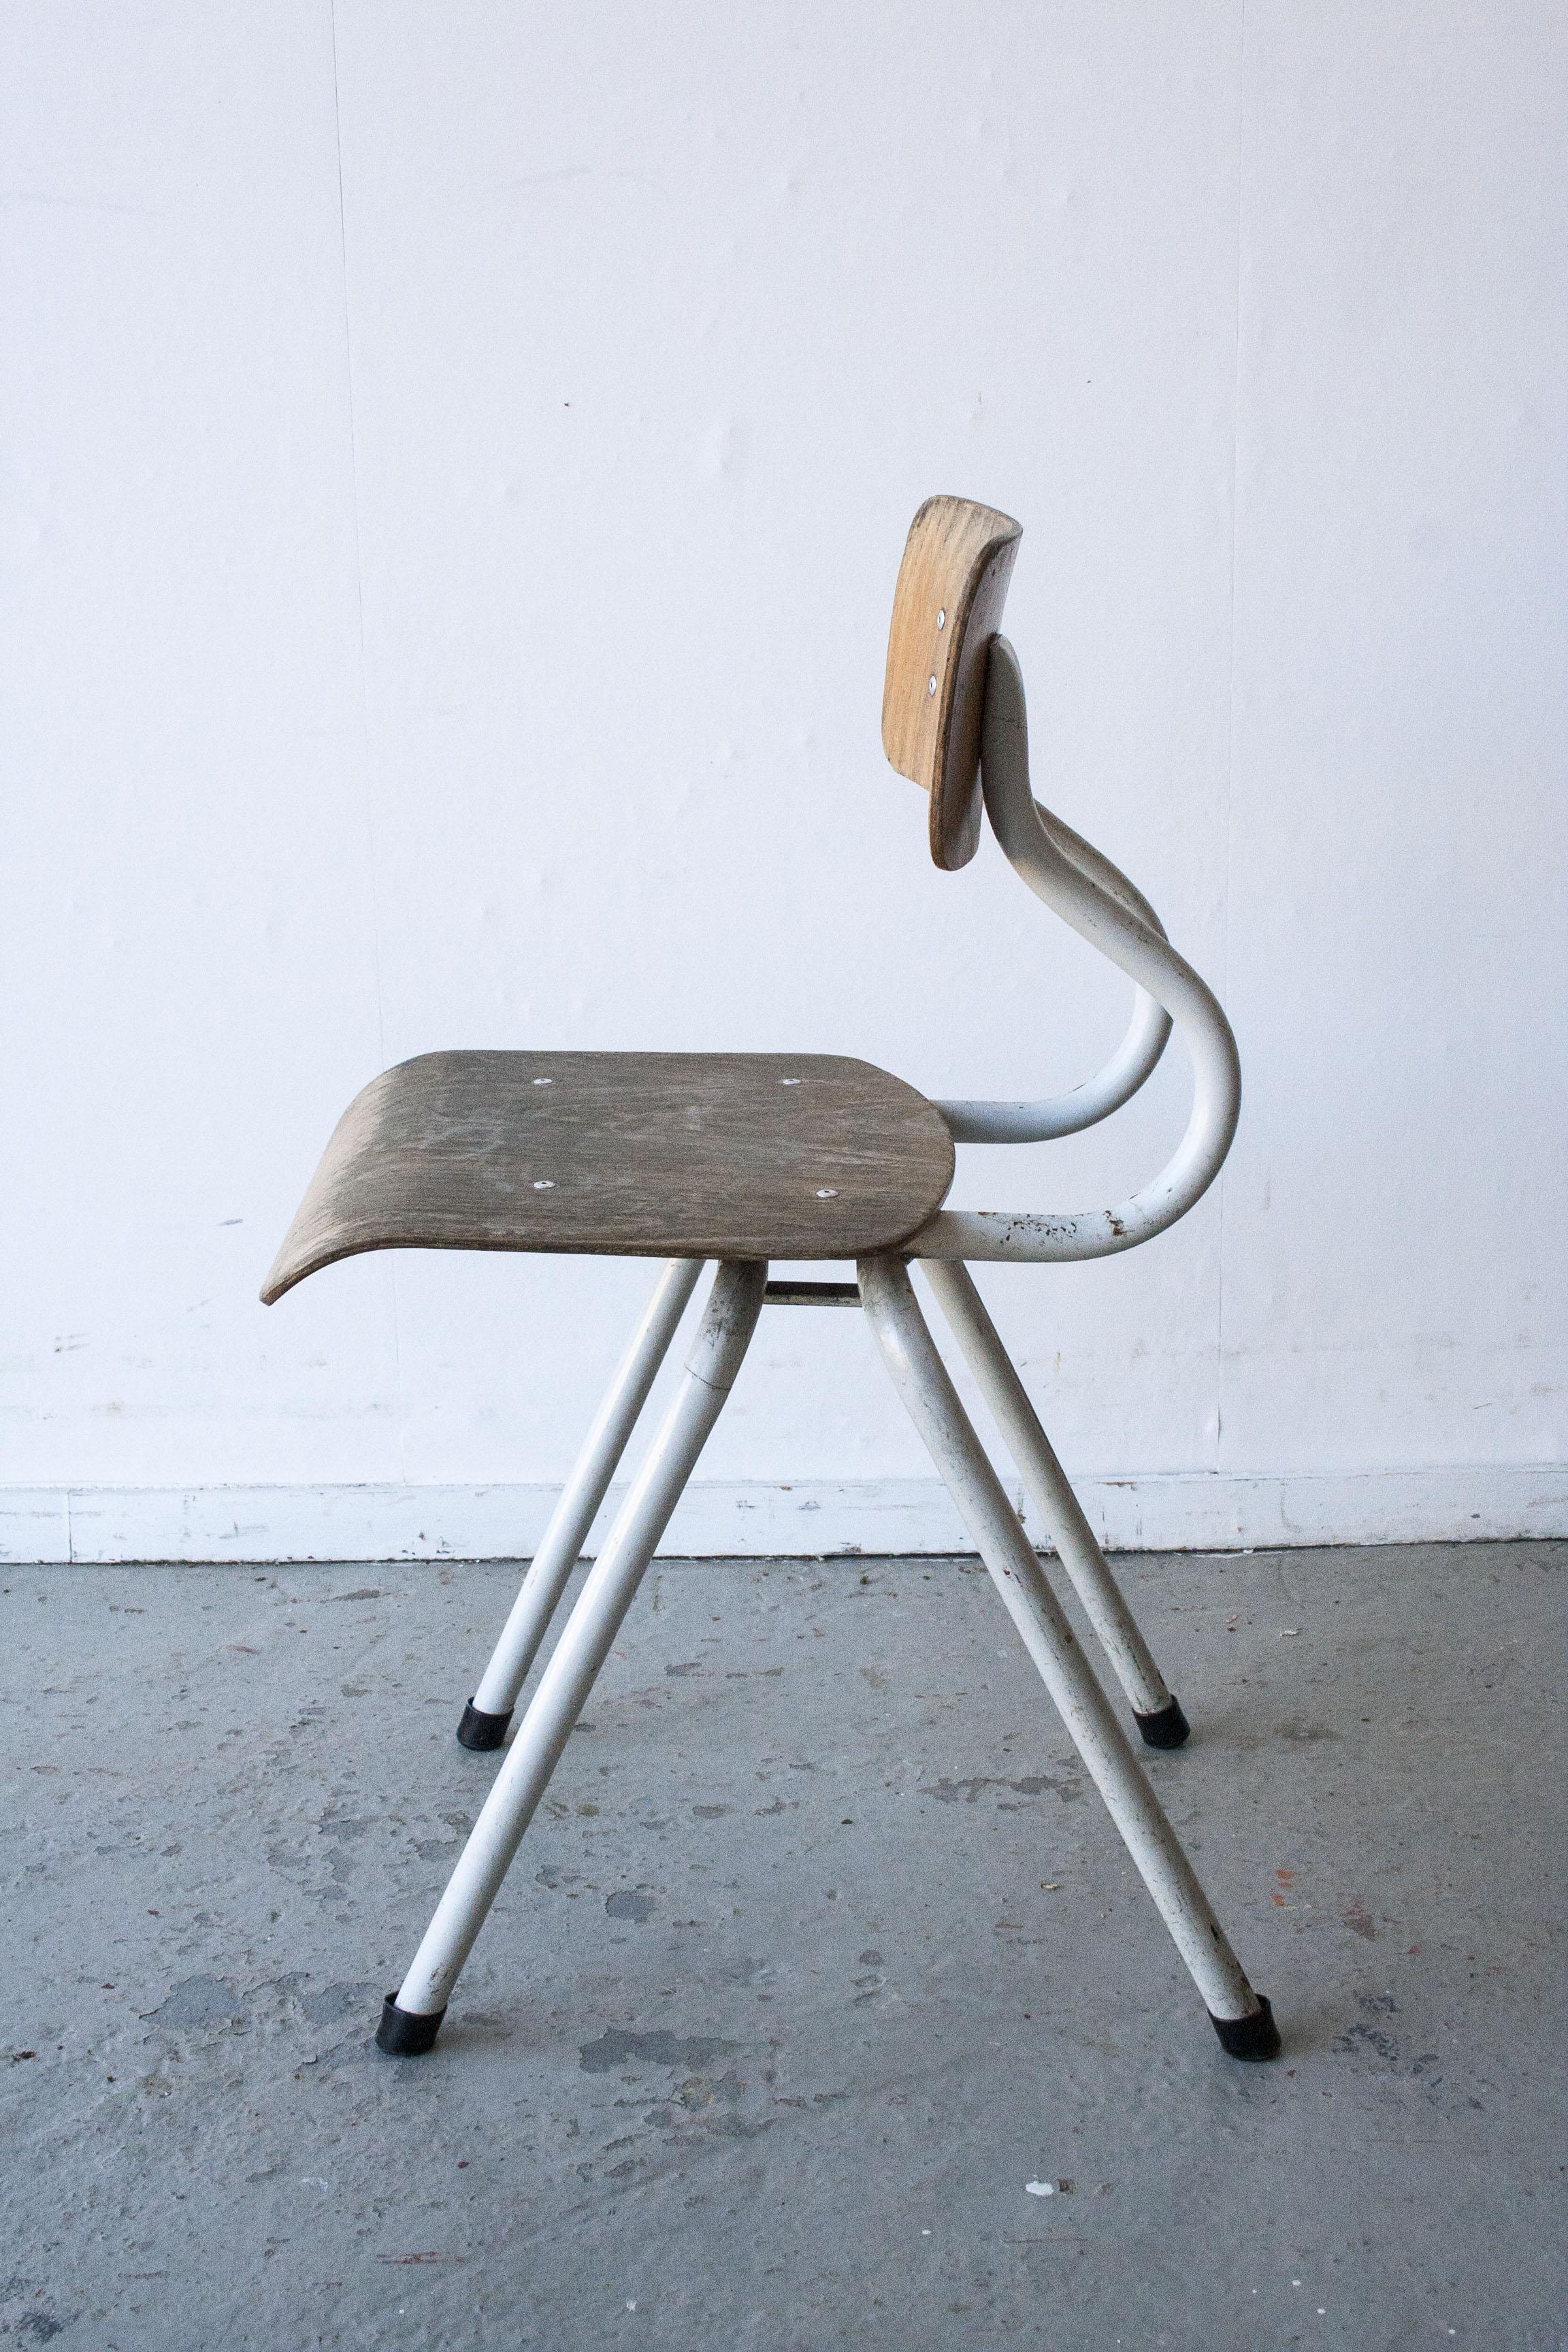 2 x Witte houten stoeltes - Firma zoethout_3.jpg